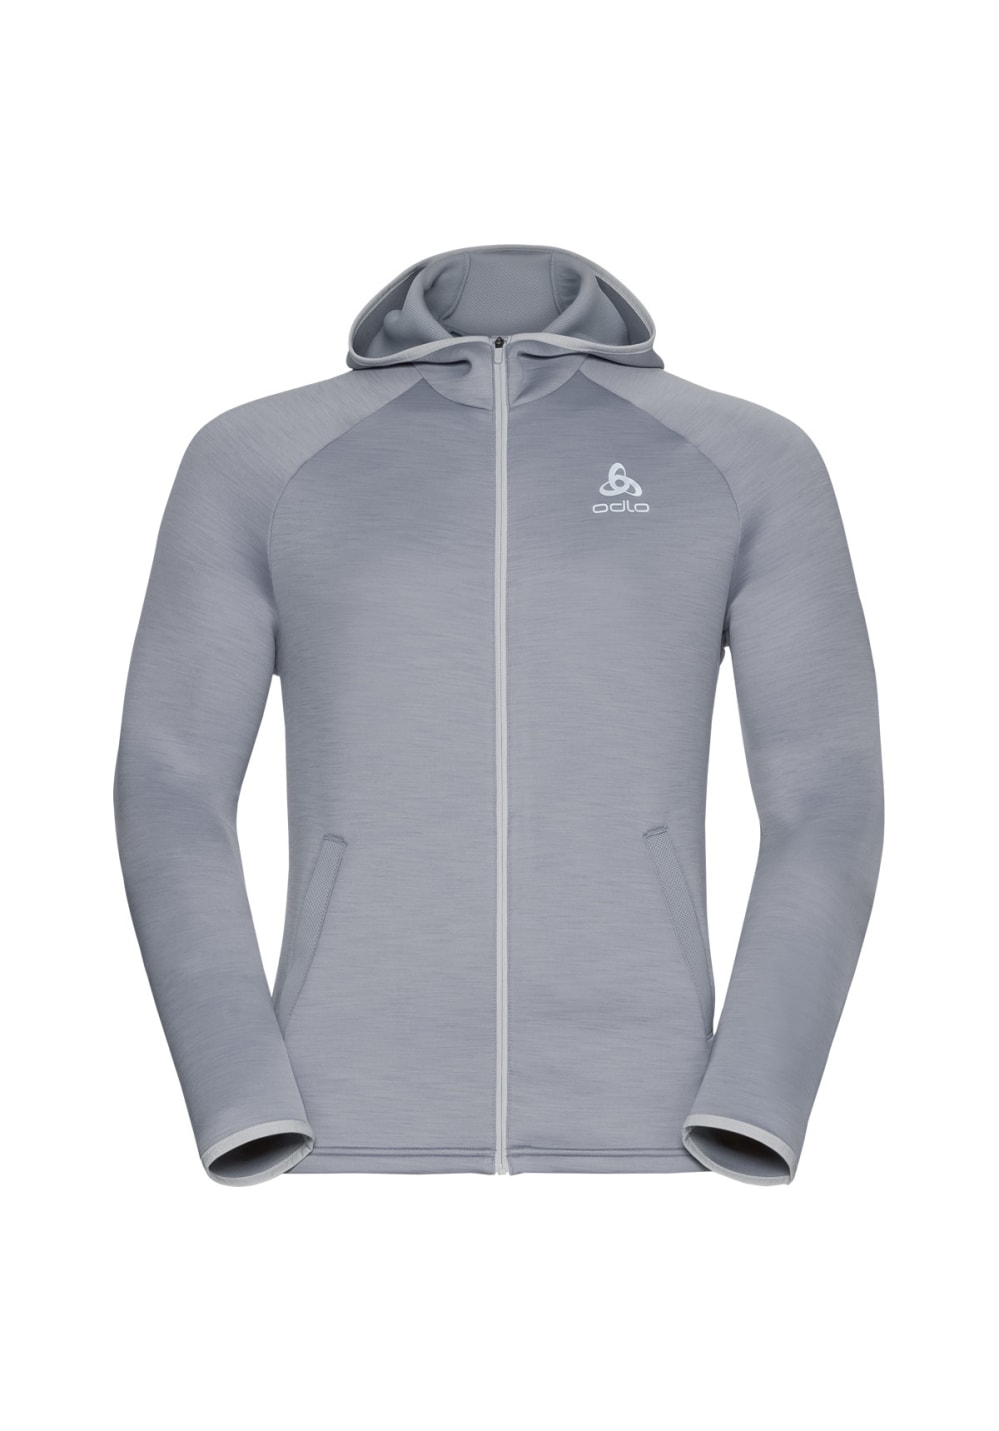 Odlo Hoody Midlayer Full Zip Pulse - Sweatshirts & Hoodies für Herren - Grau, G